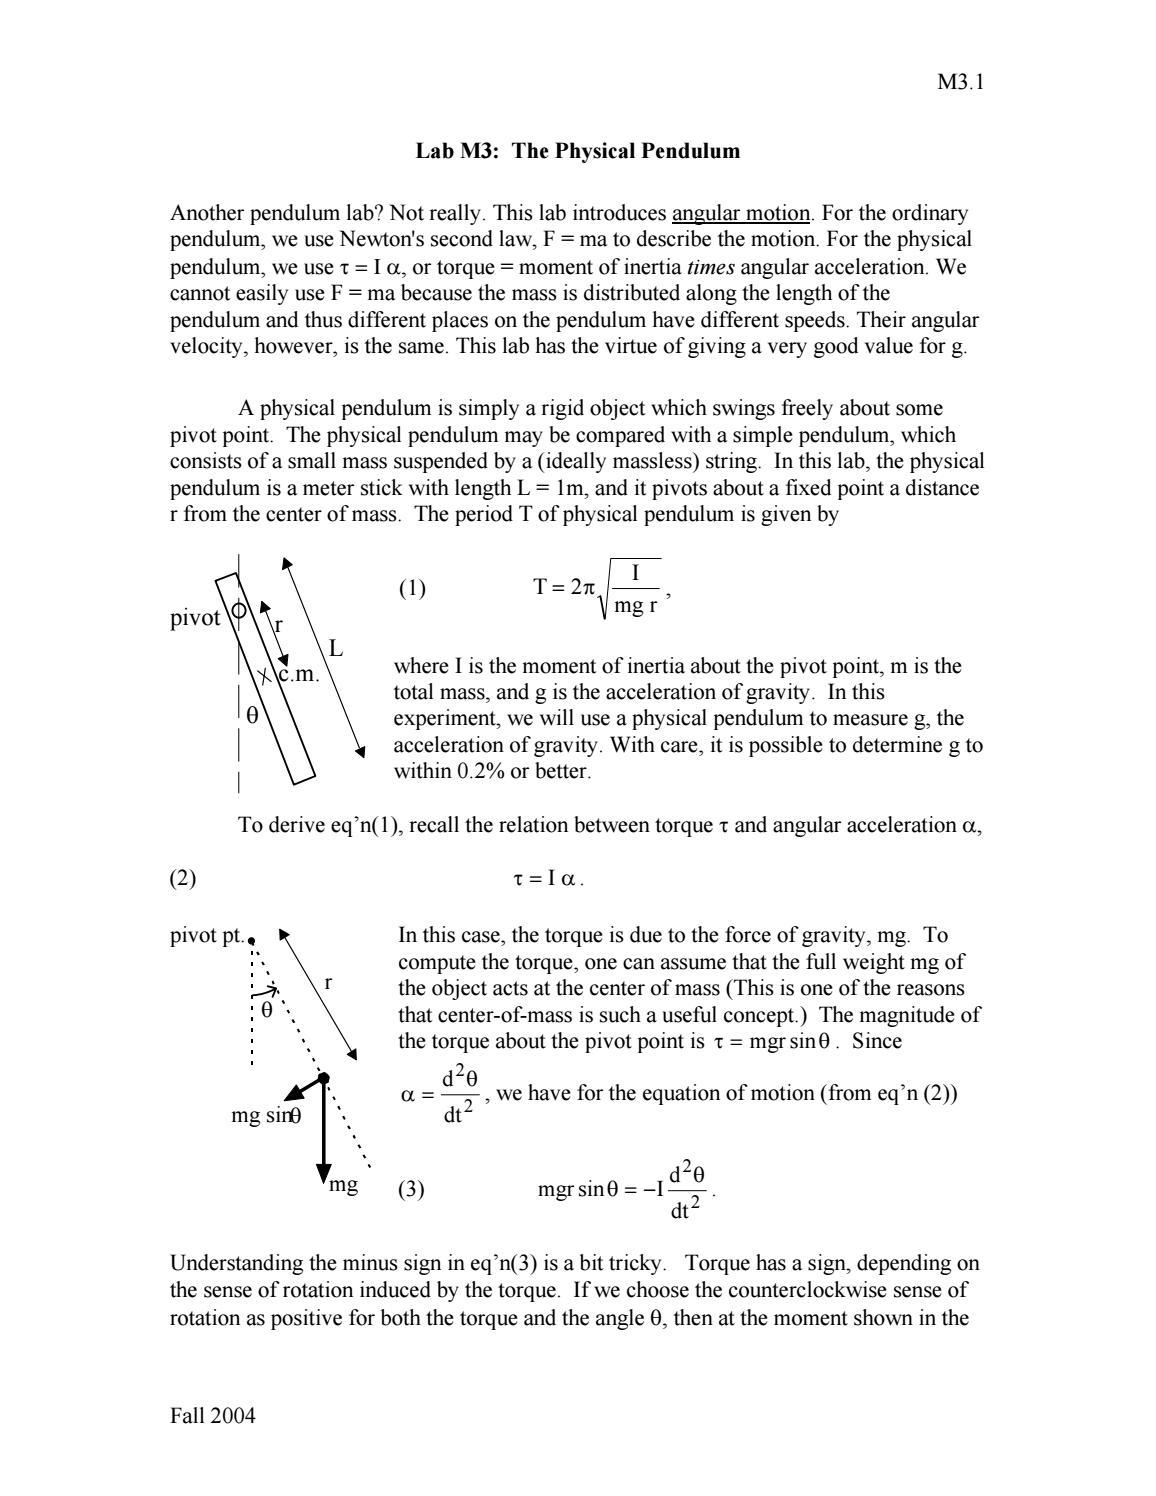 1st Year Physics Lab Manual Experiment M3 (University of Colorado